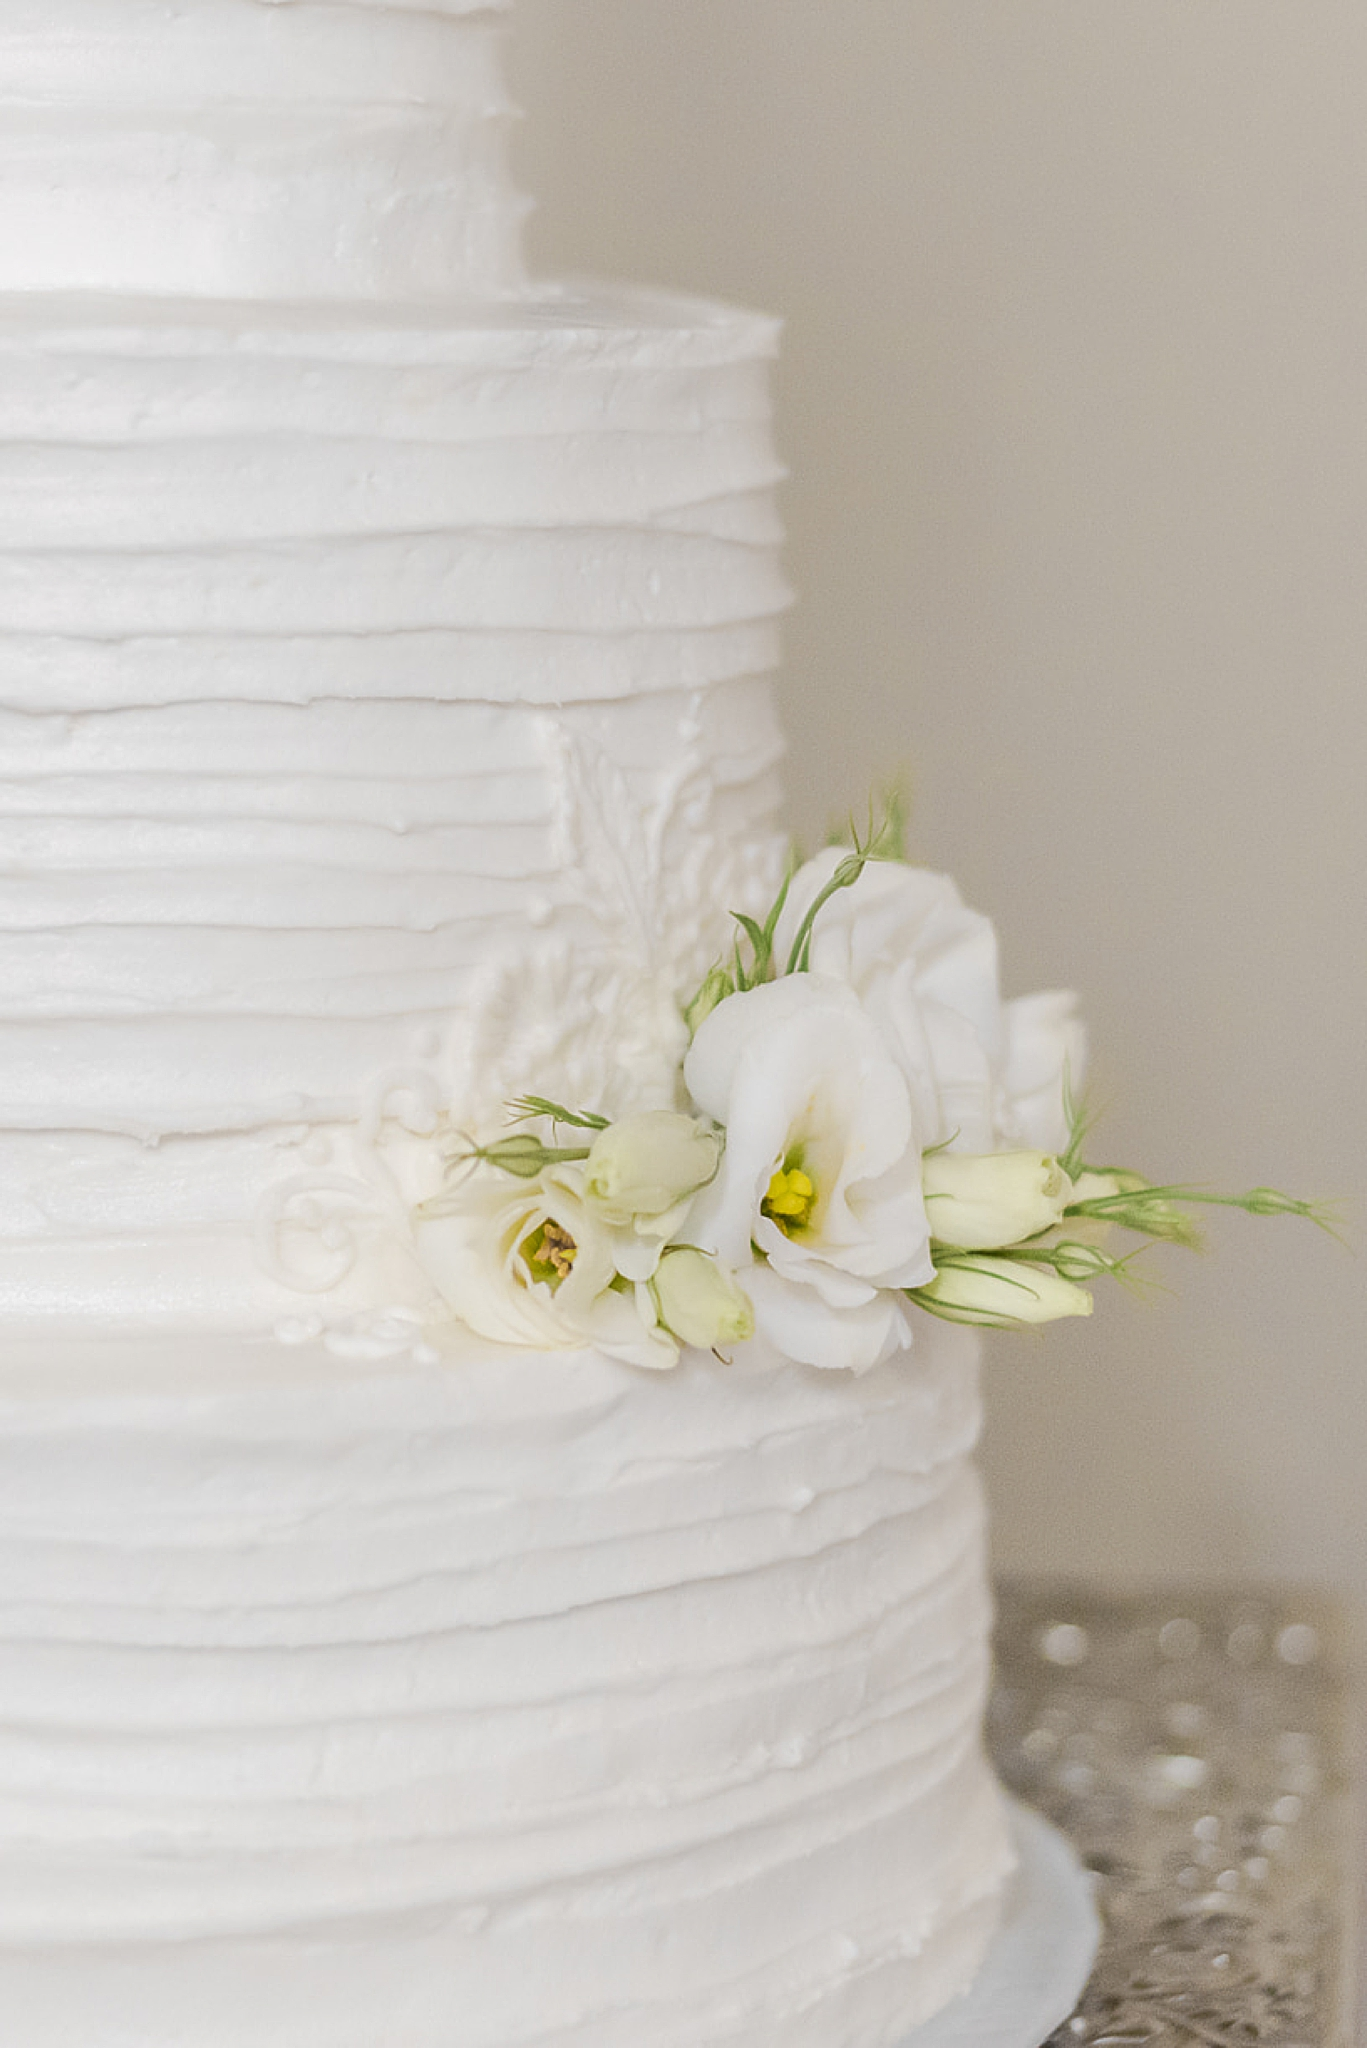 floral details on white wedding cake